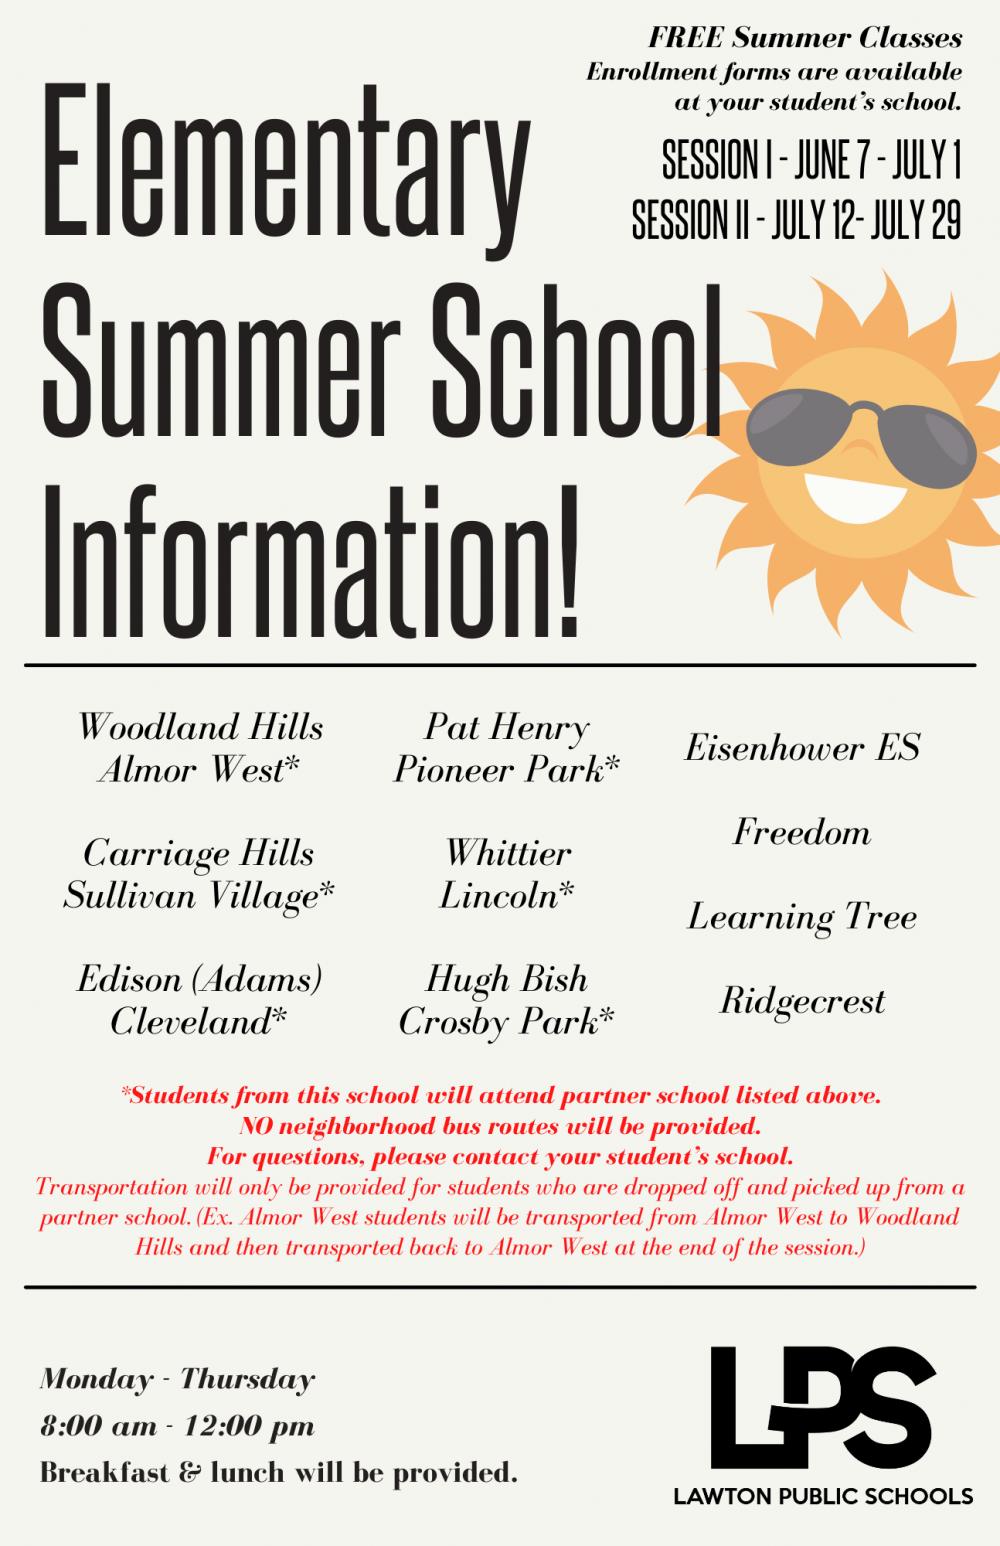 Elementary Summer School